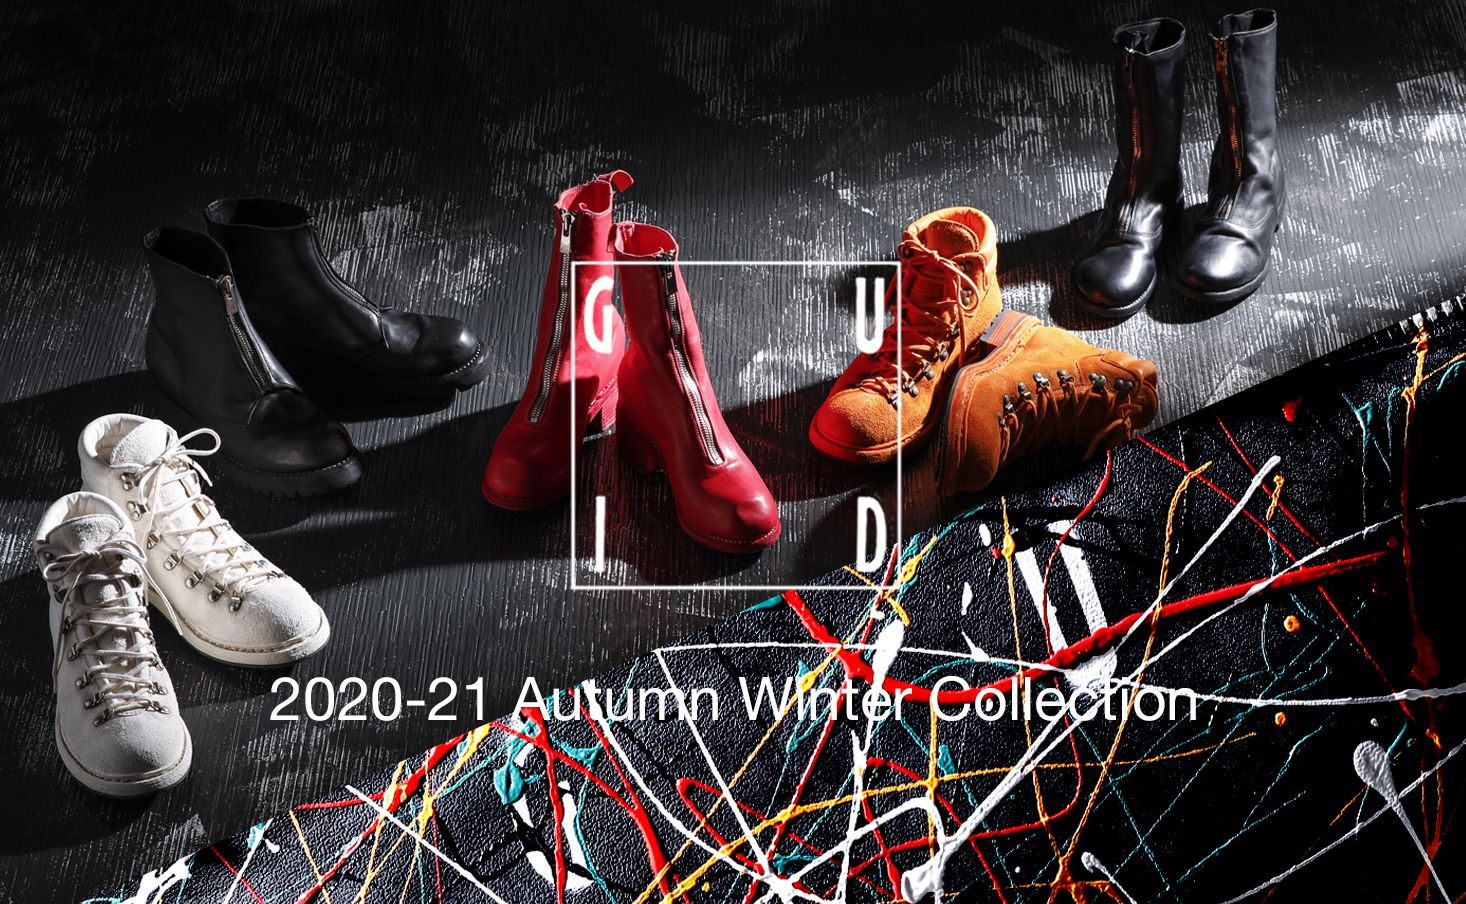 GUIDI 2020-21AW collection